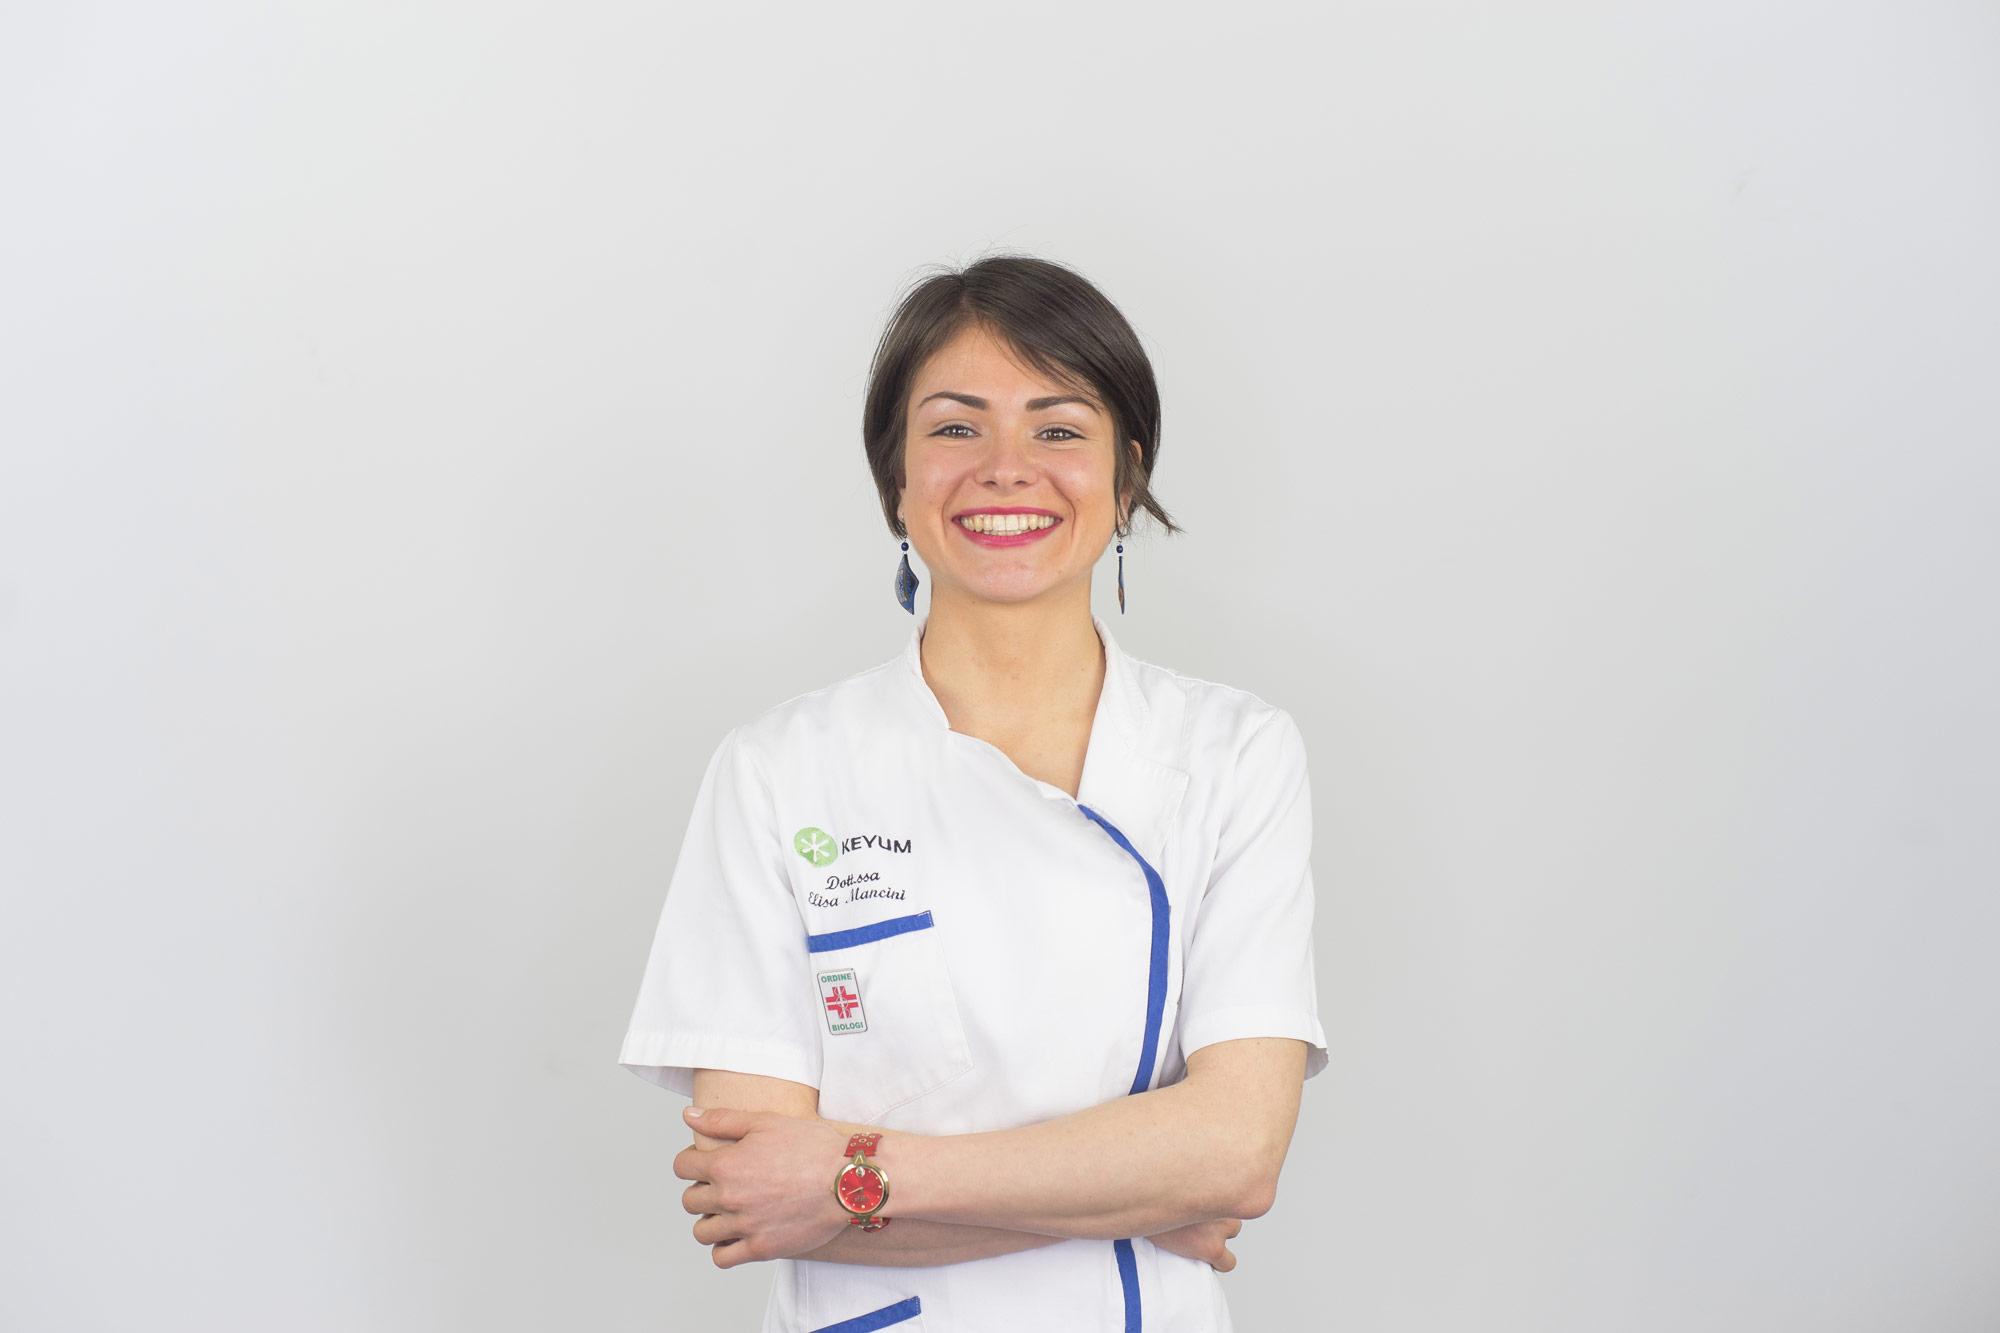 Elisa Manicini